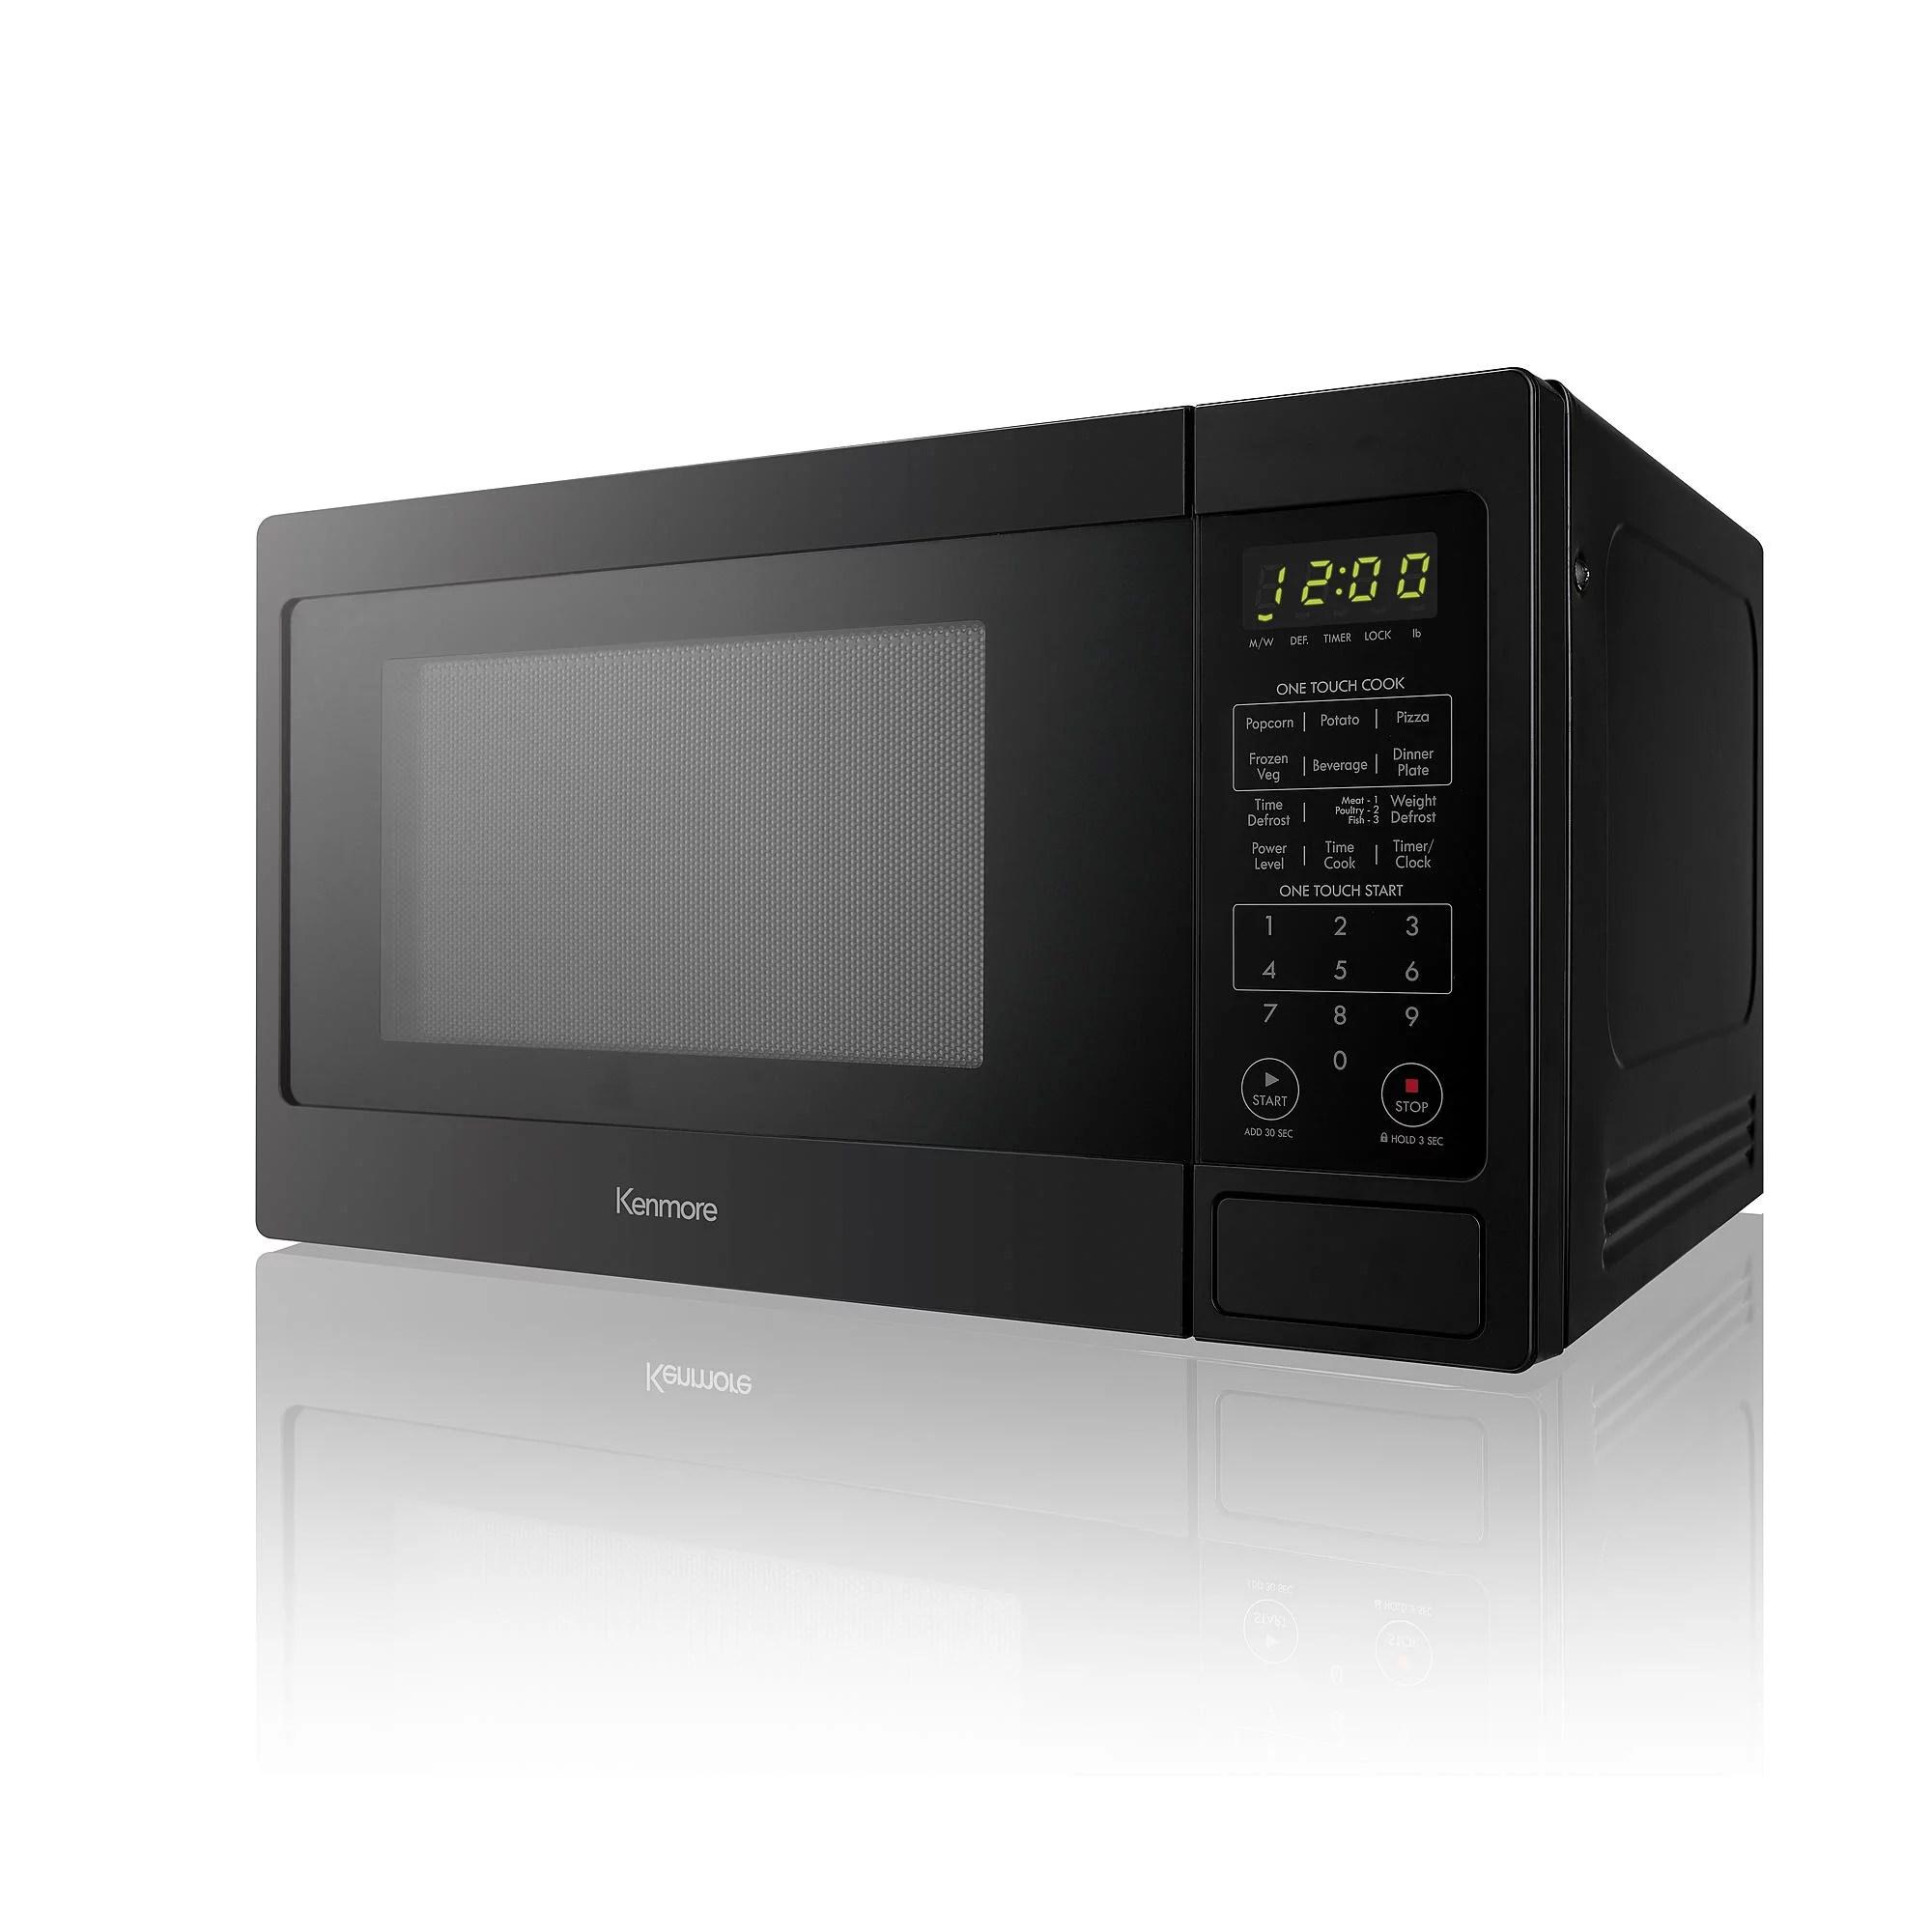 kenmore 70919 countertop microwave oven 0 9 cu ft black